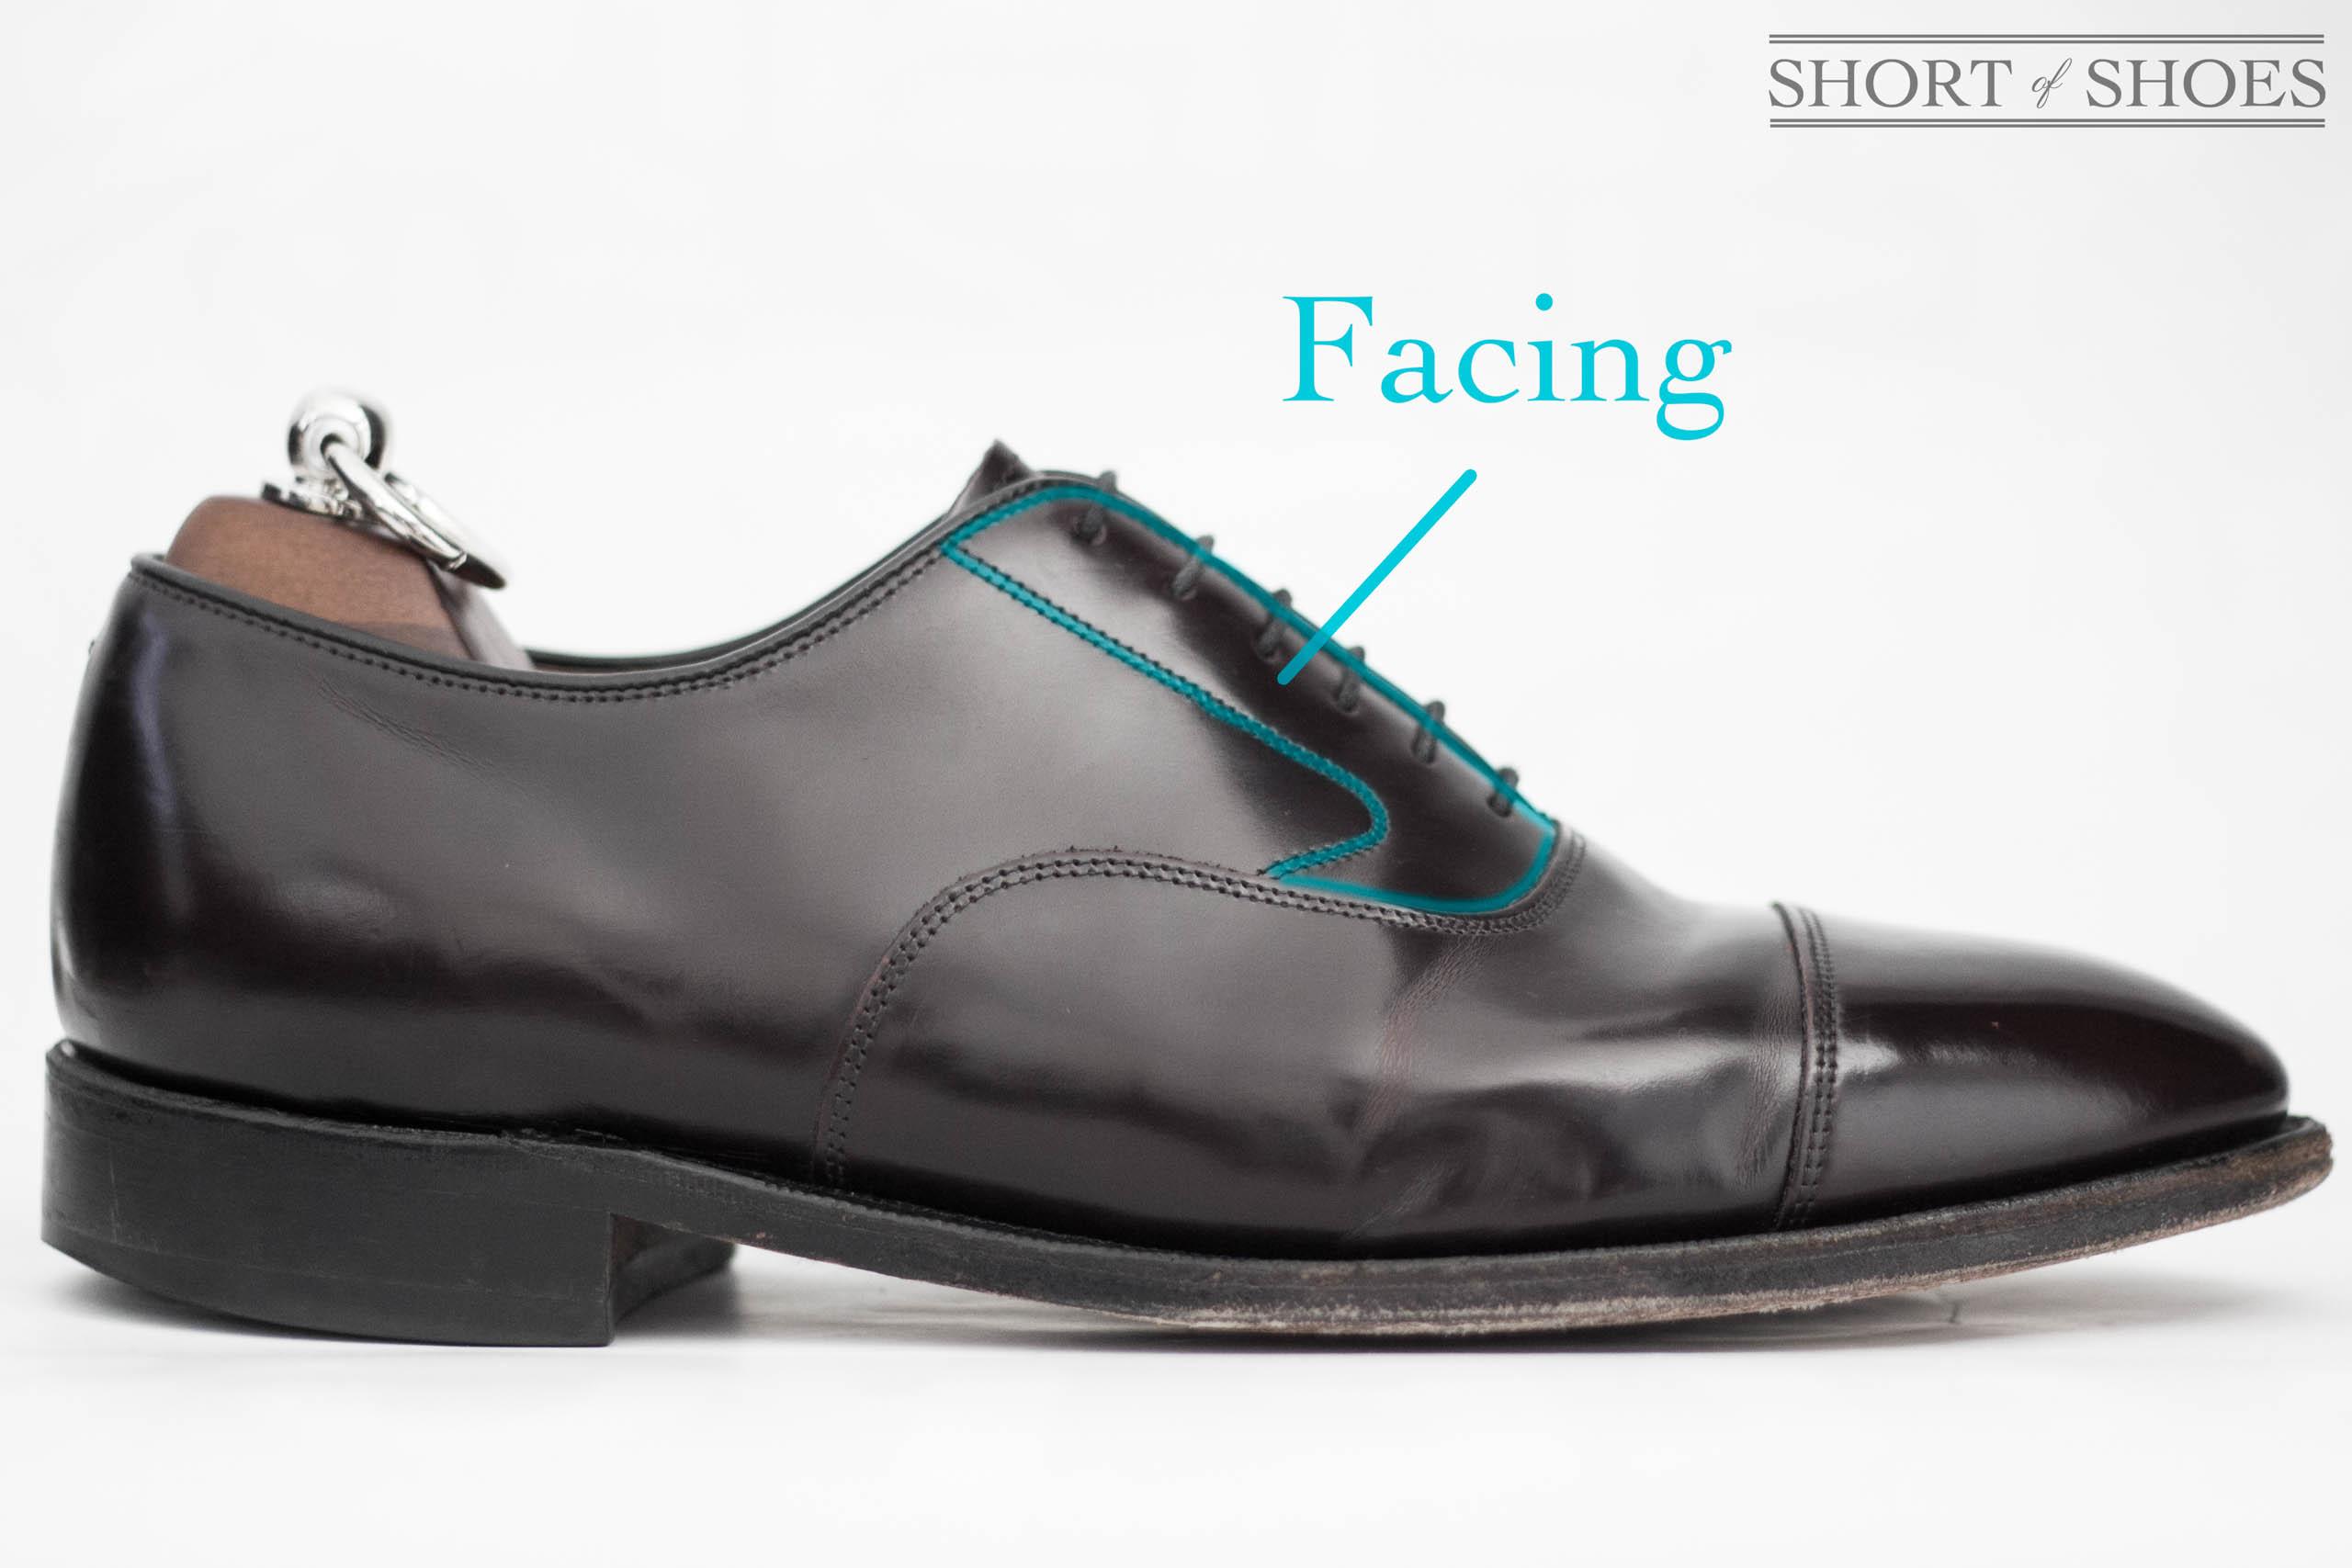 Oxford Shoe Definition - 28 Images - Oxford Shoes Definition 28 Images Shoe Types And Oxford ...